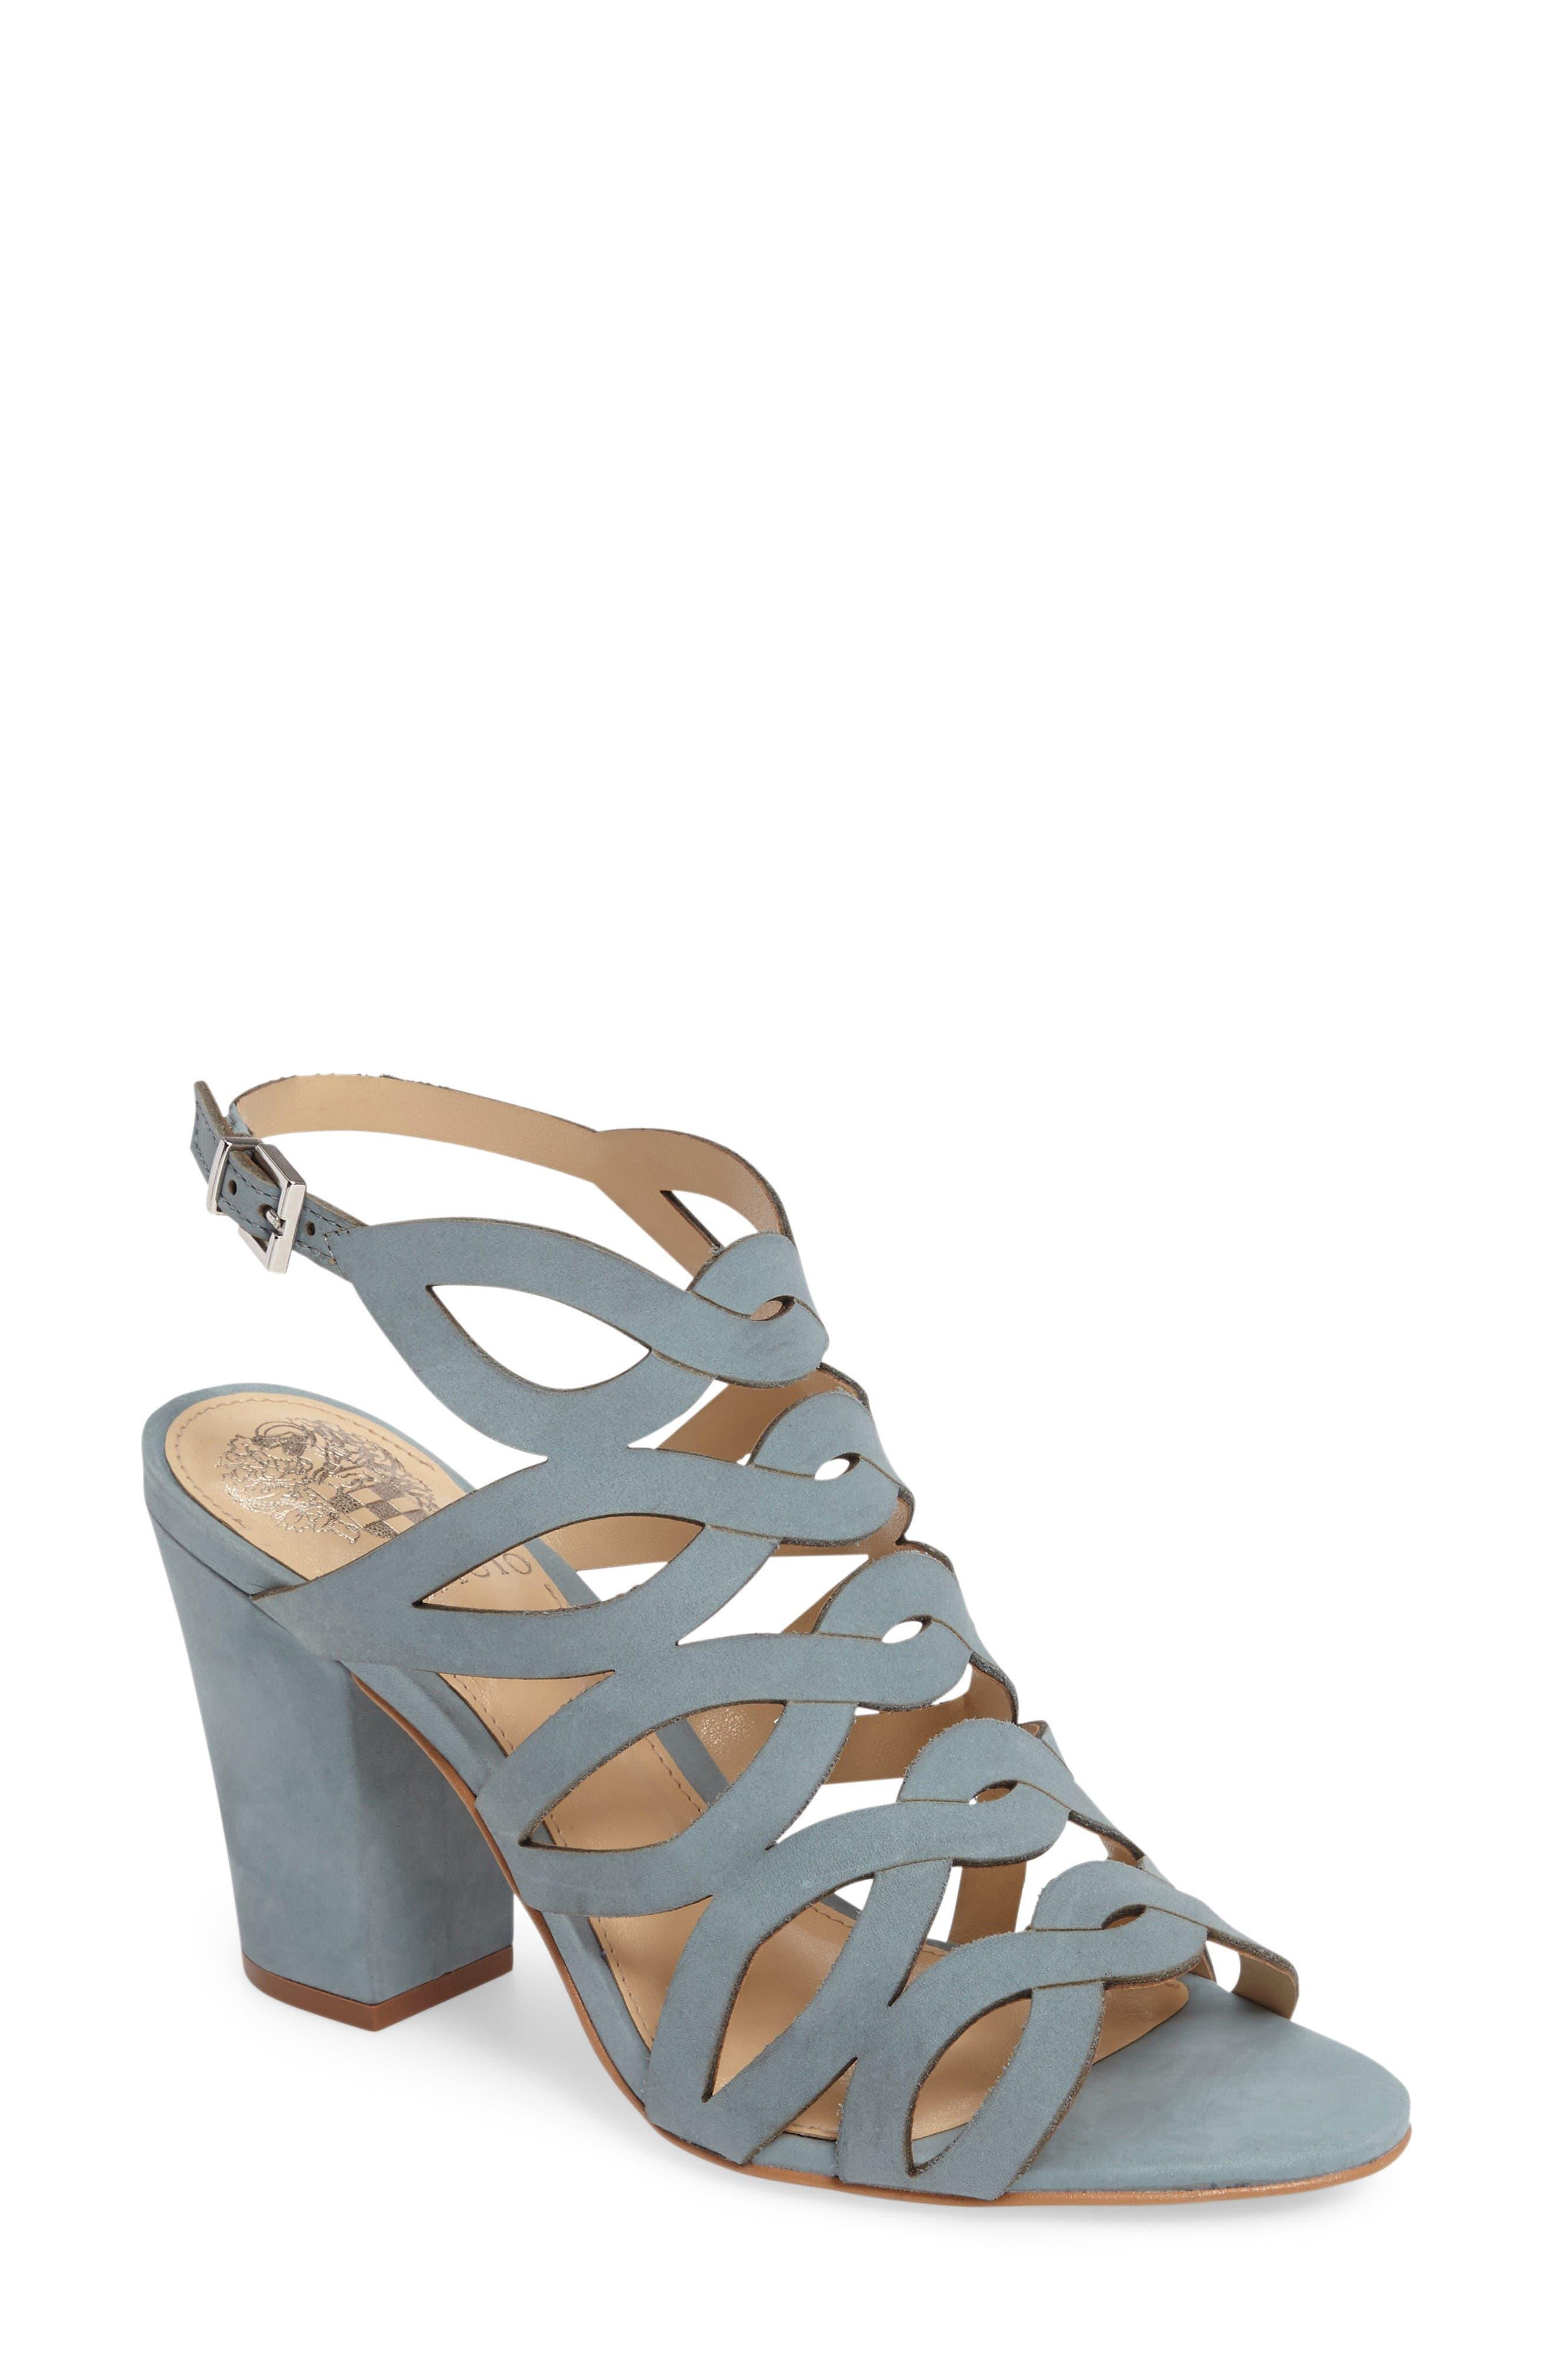 Main Image - Vince Camuto Norla Block Heel Sandal (Women)